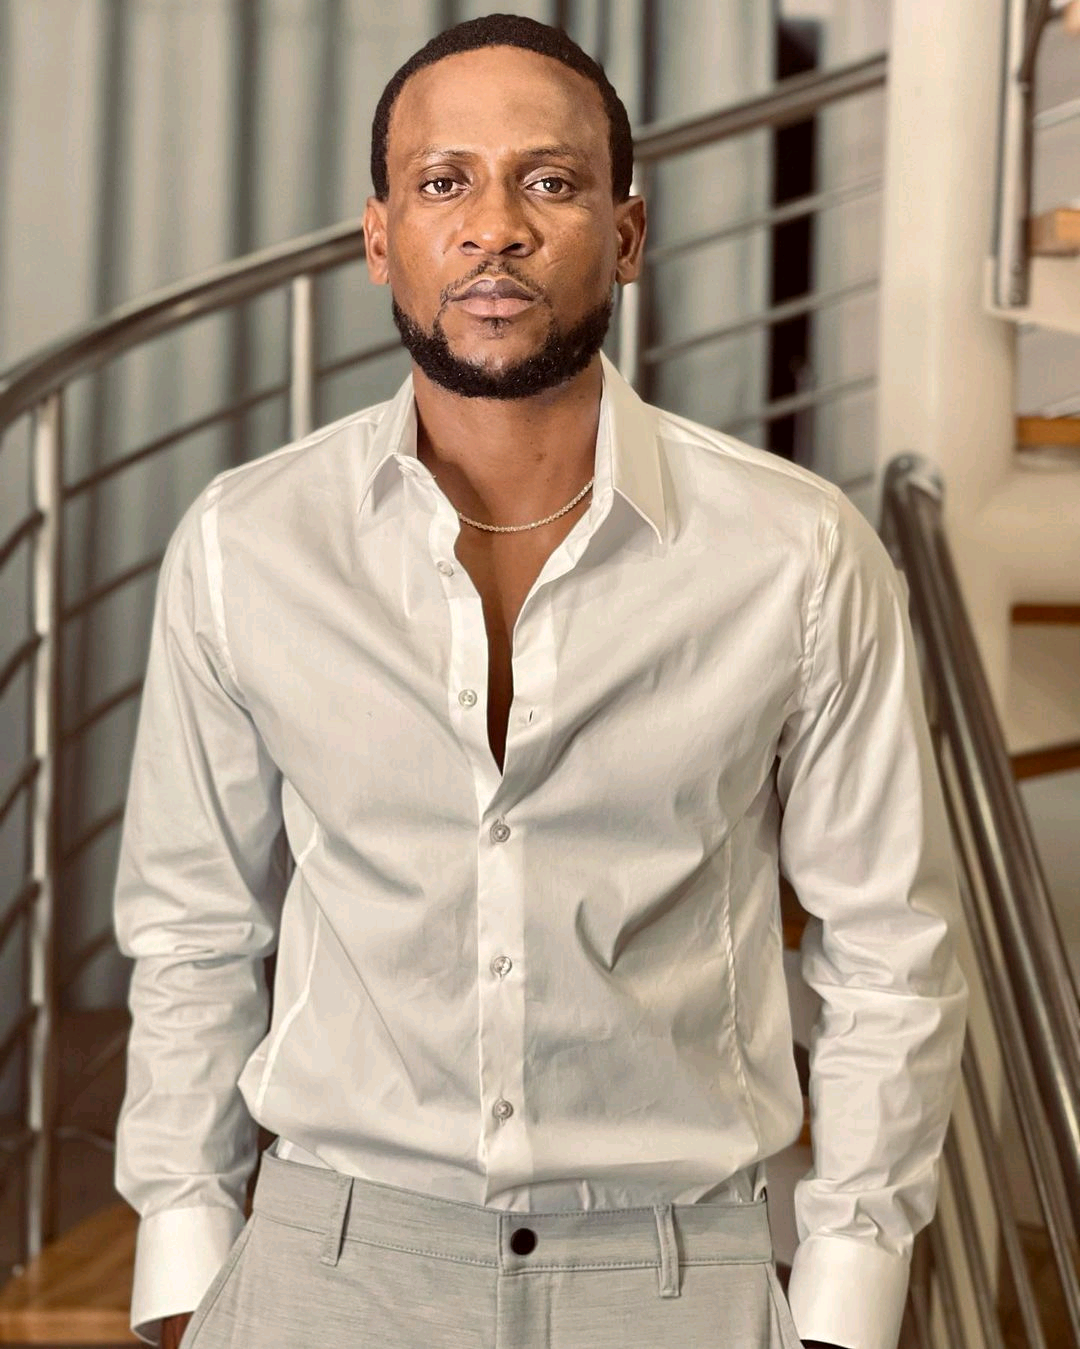 """Leave Me Alone,"" BBNaija's Omashola Tells Those Pressuring Him To Get Married"